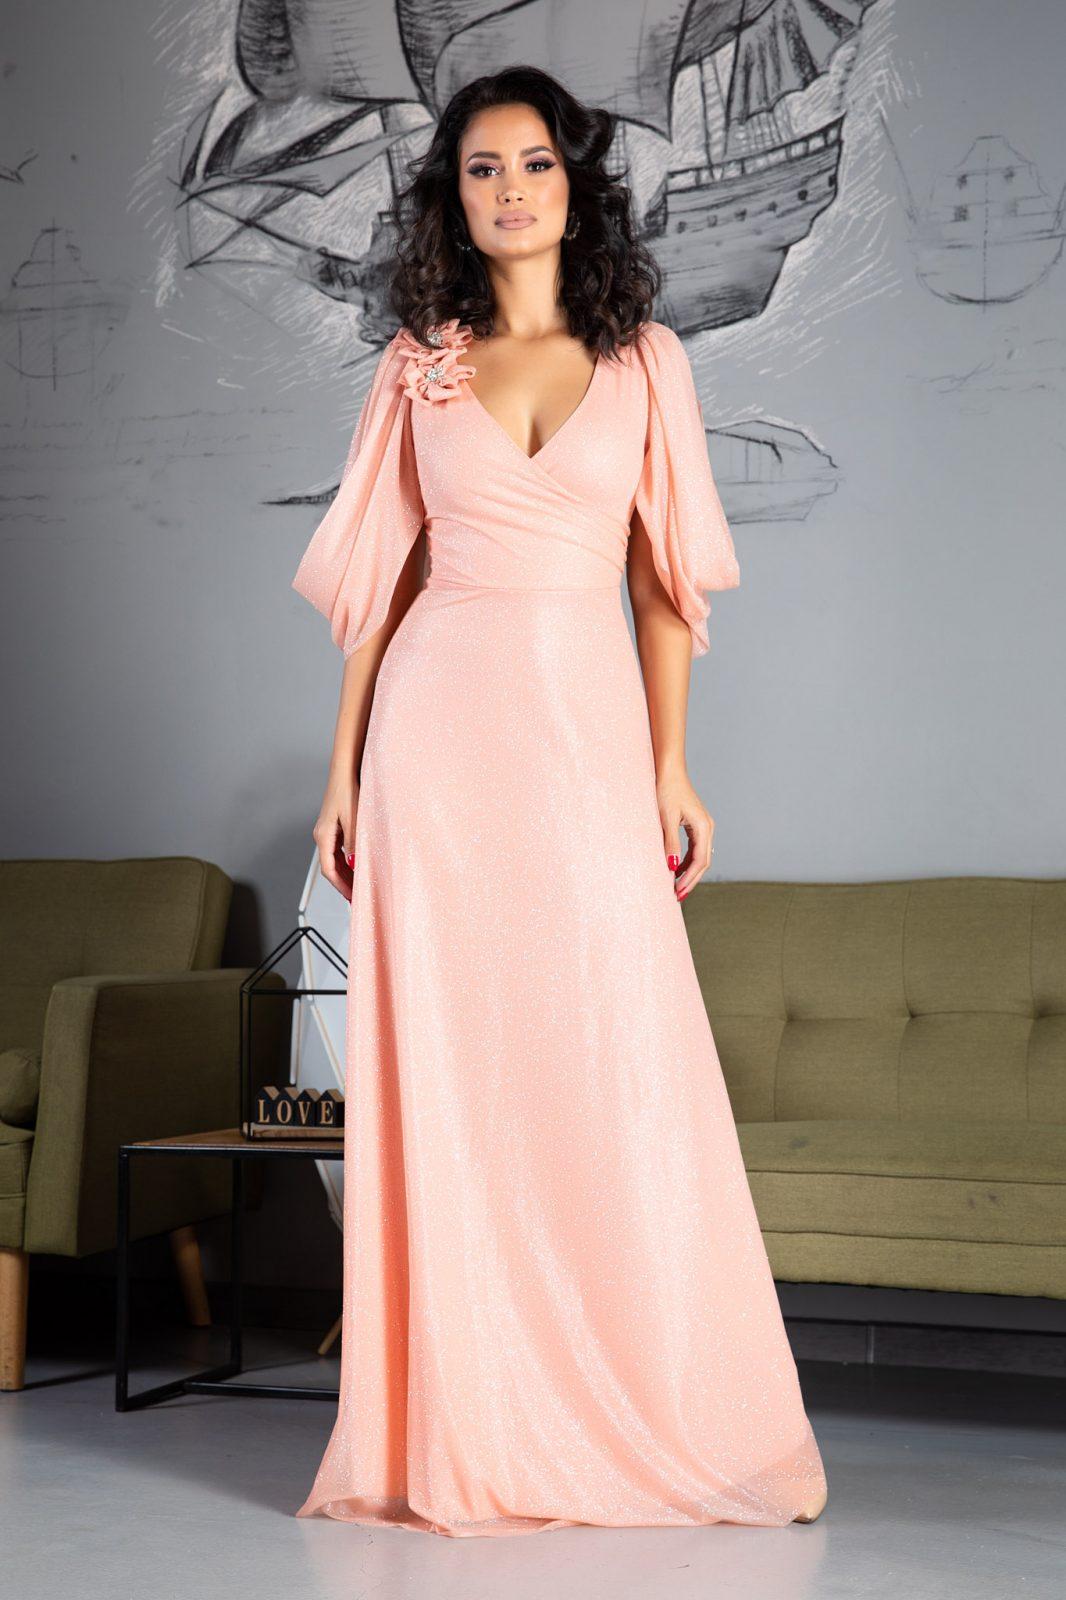 Teresa Maxi Ροζ Φόρεμα 5031